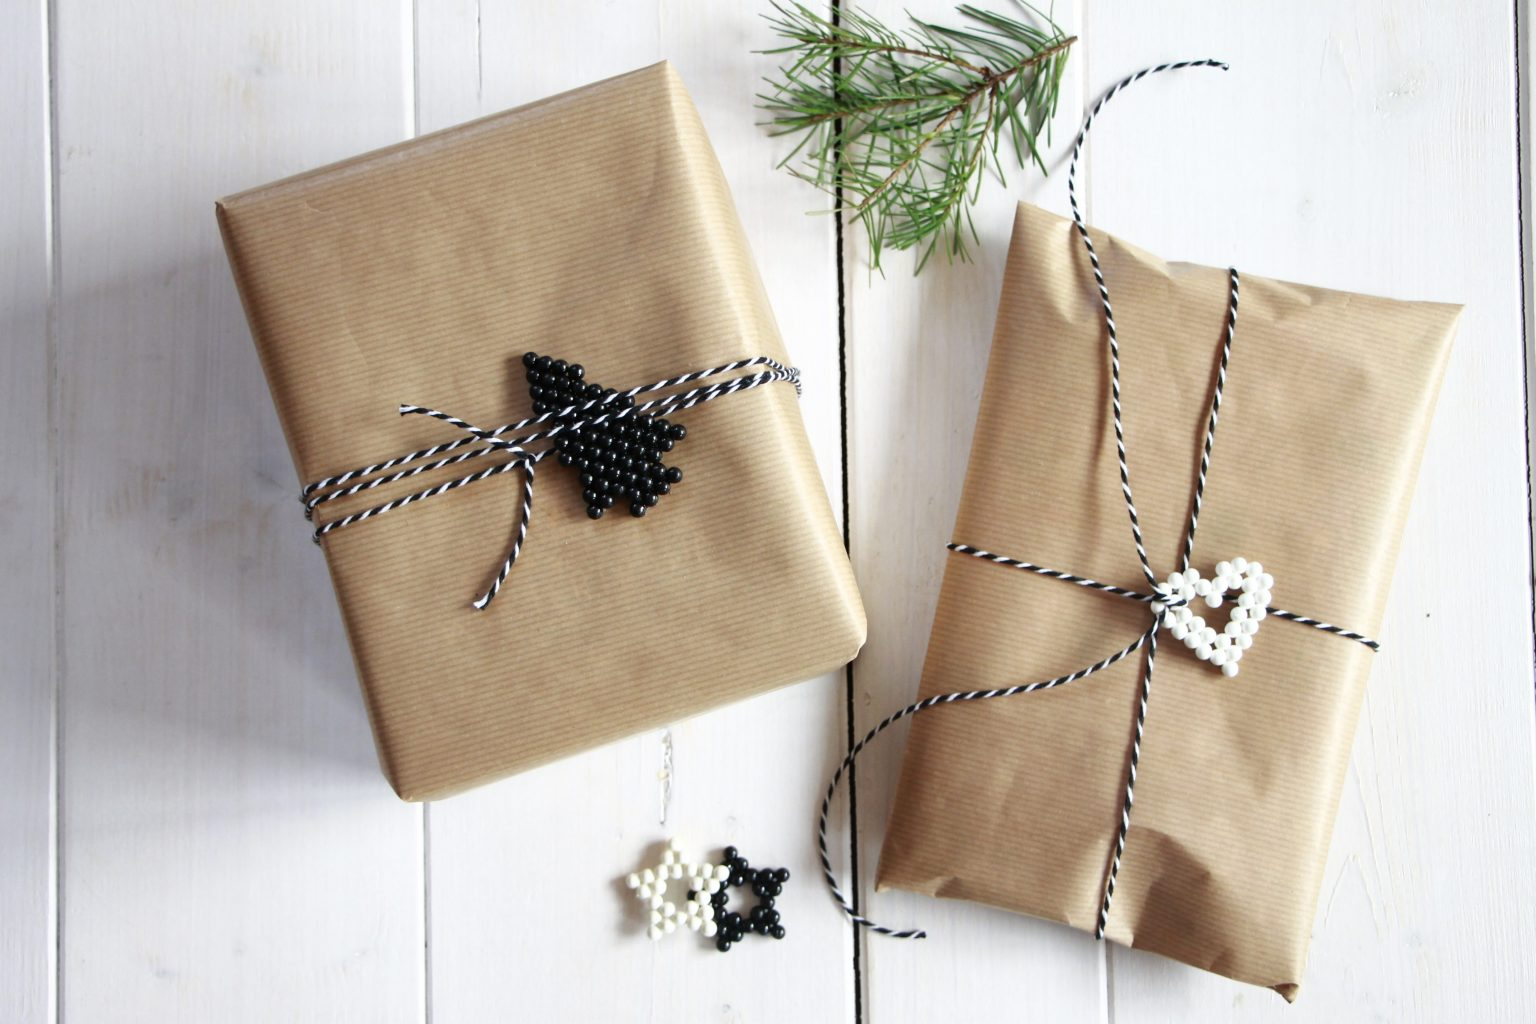 Weihnachtsgeschenke verpacken Ideen Packpapier